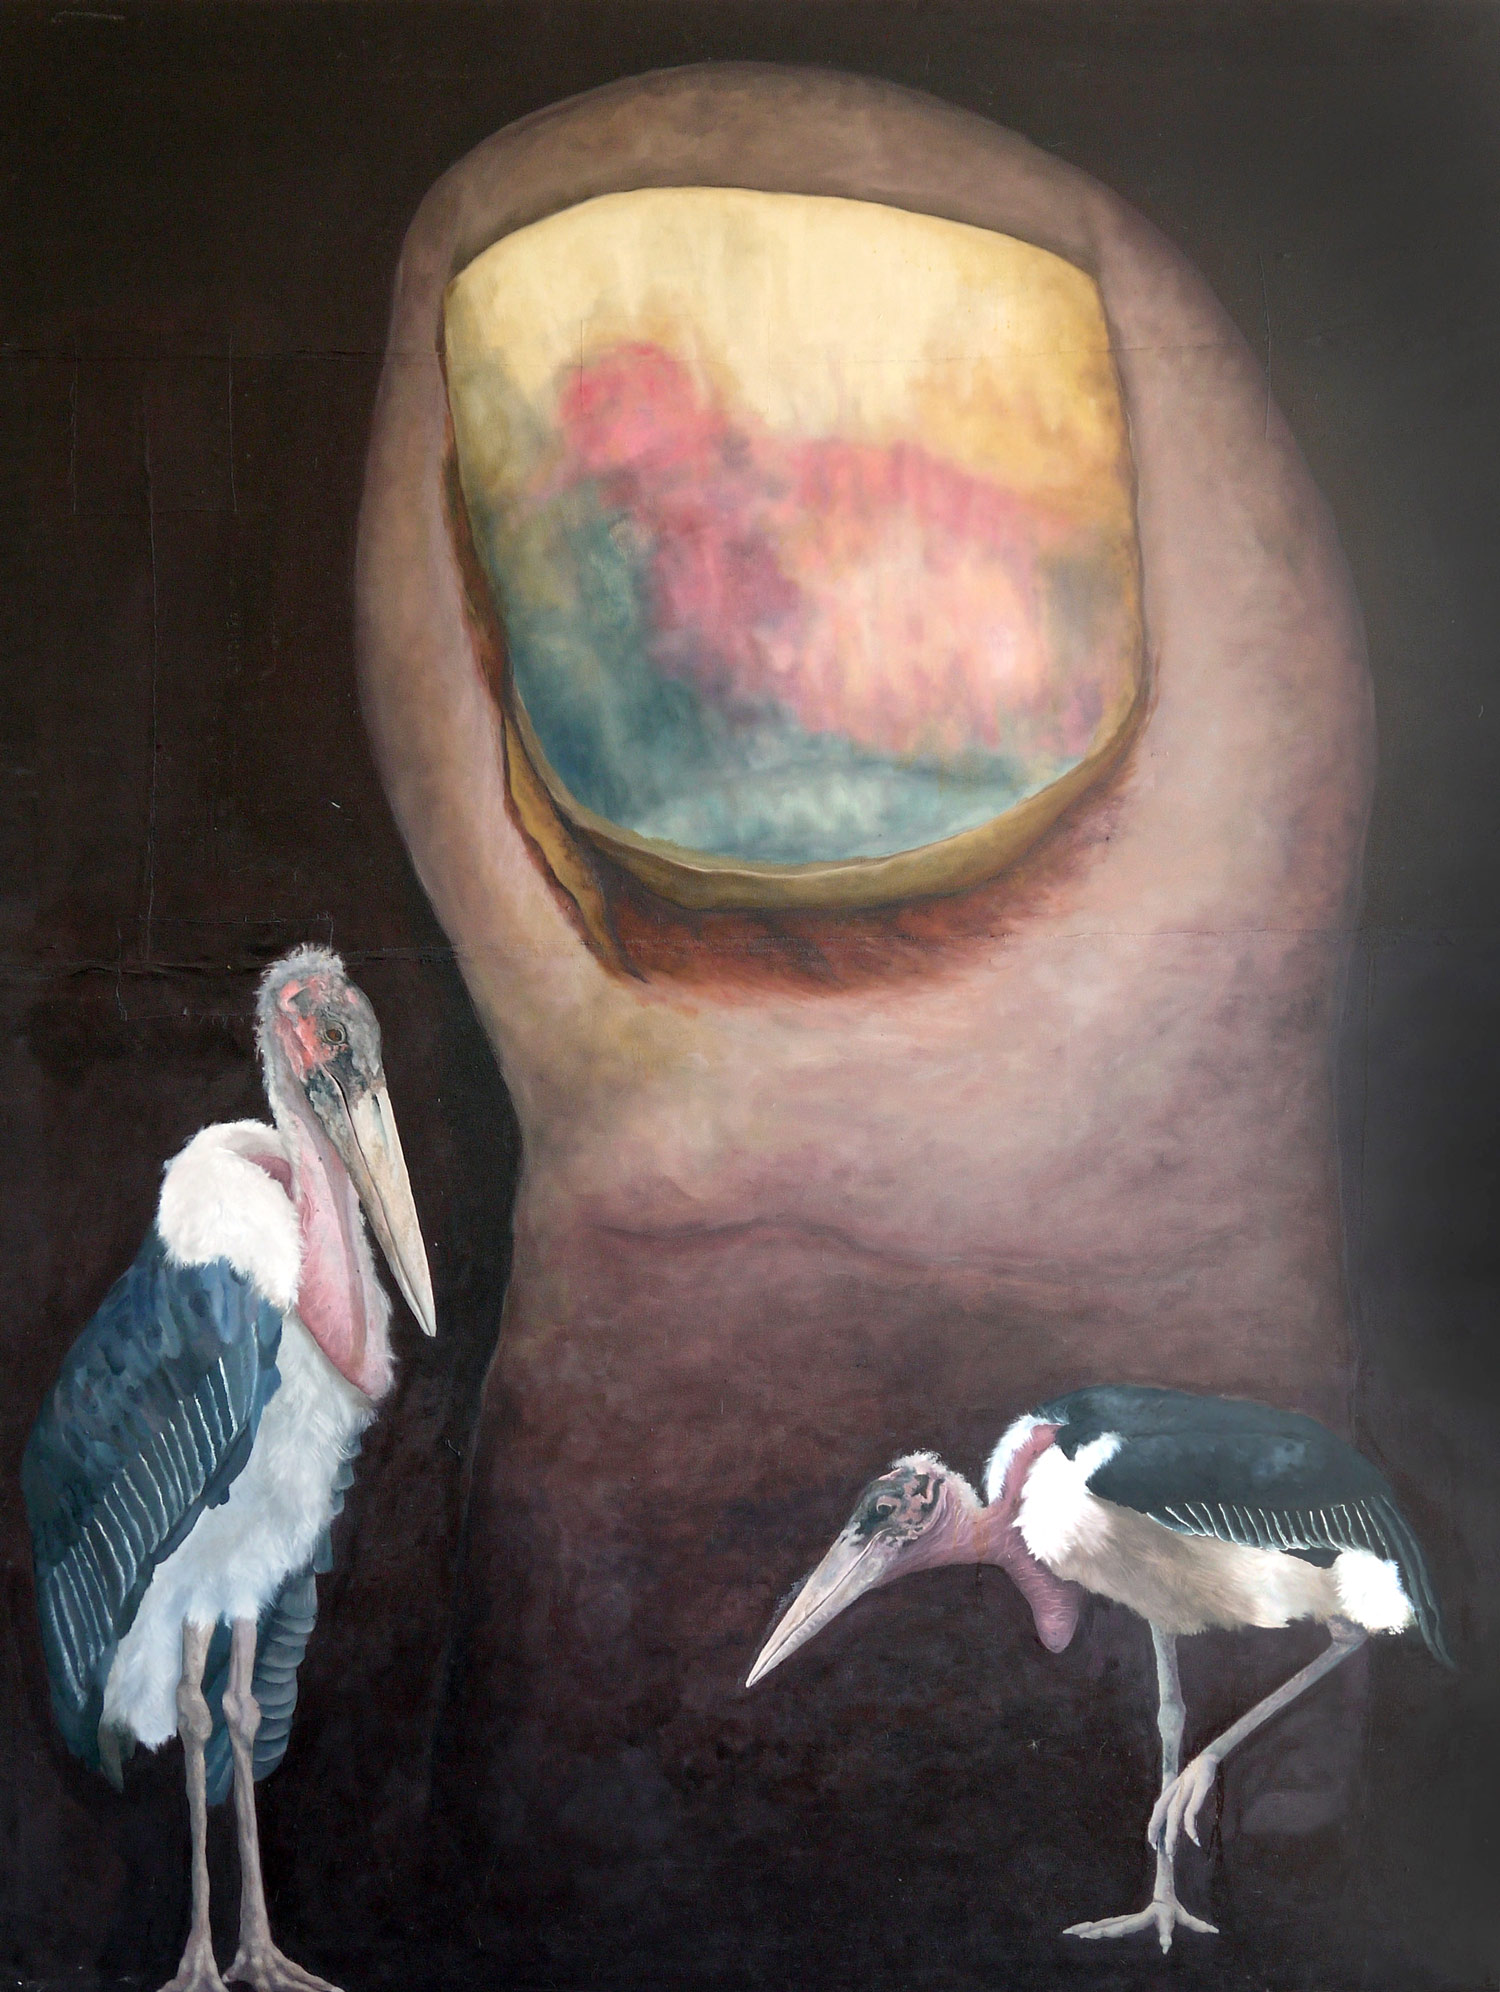 Laura Link . ohne Titel . 2014 . Öl auf Leinwand . 228 x 172